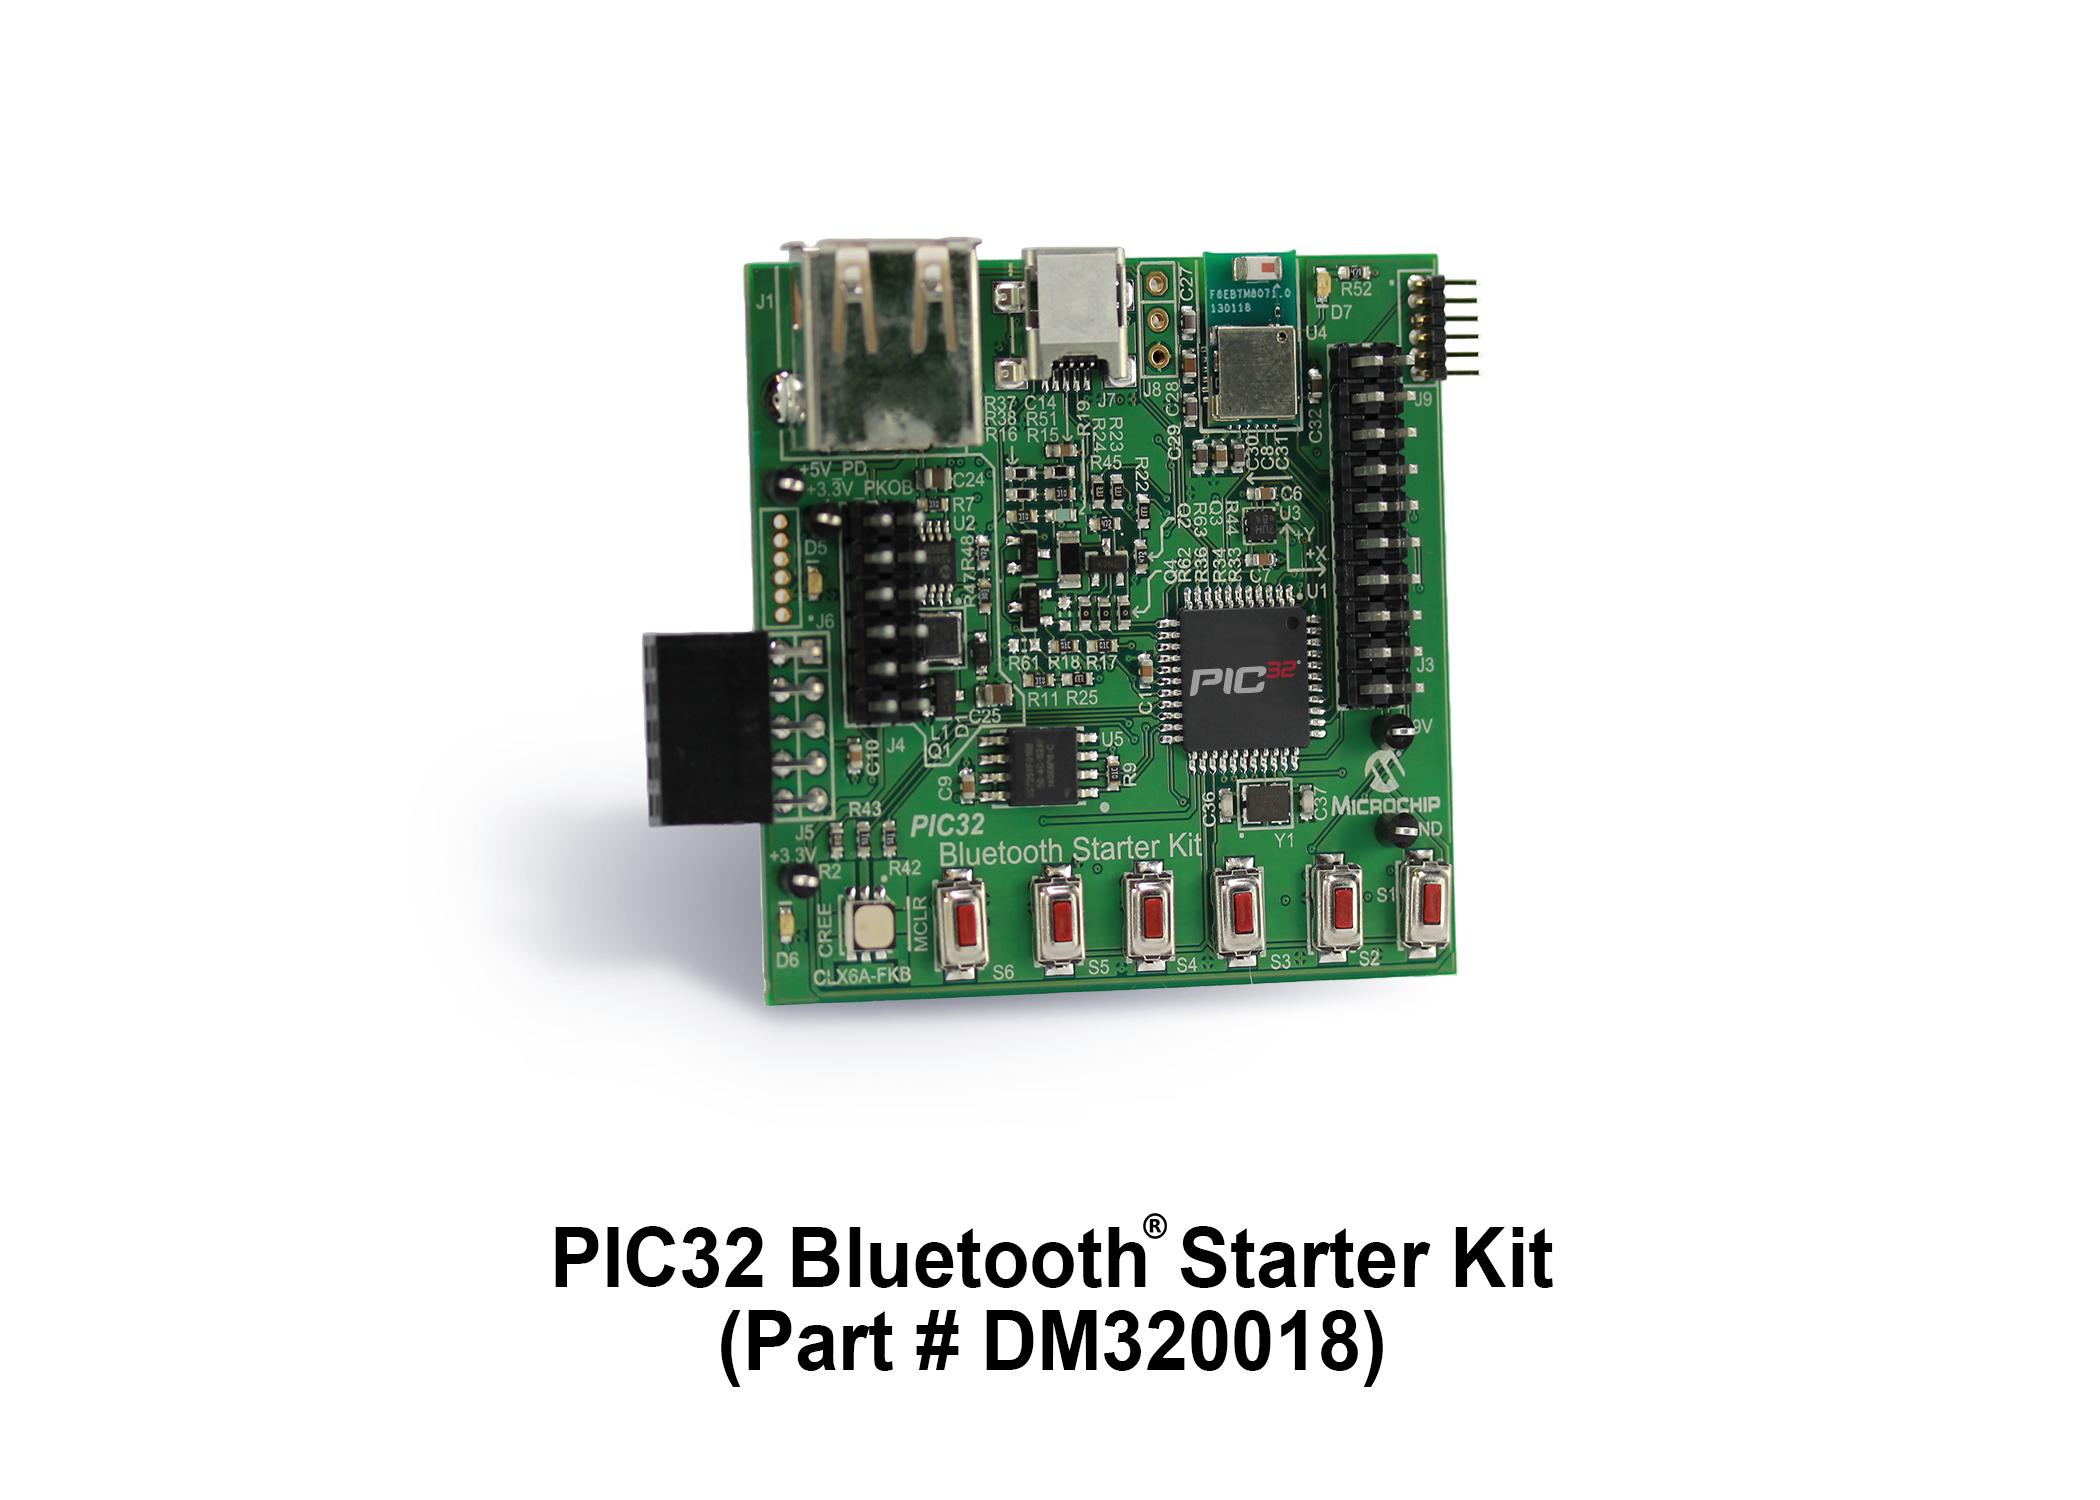 Microchip推出PIC32蓝牙®入门工具包